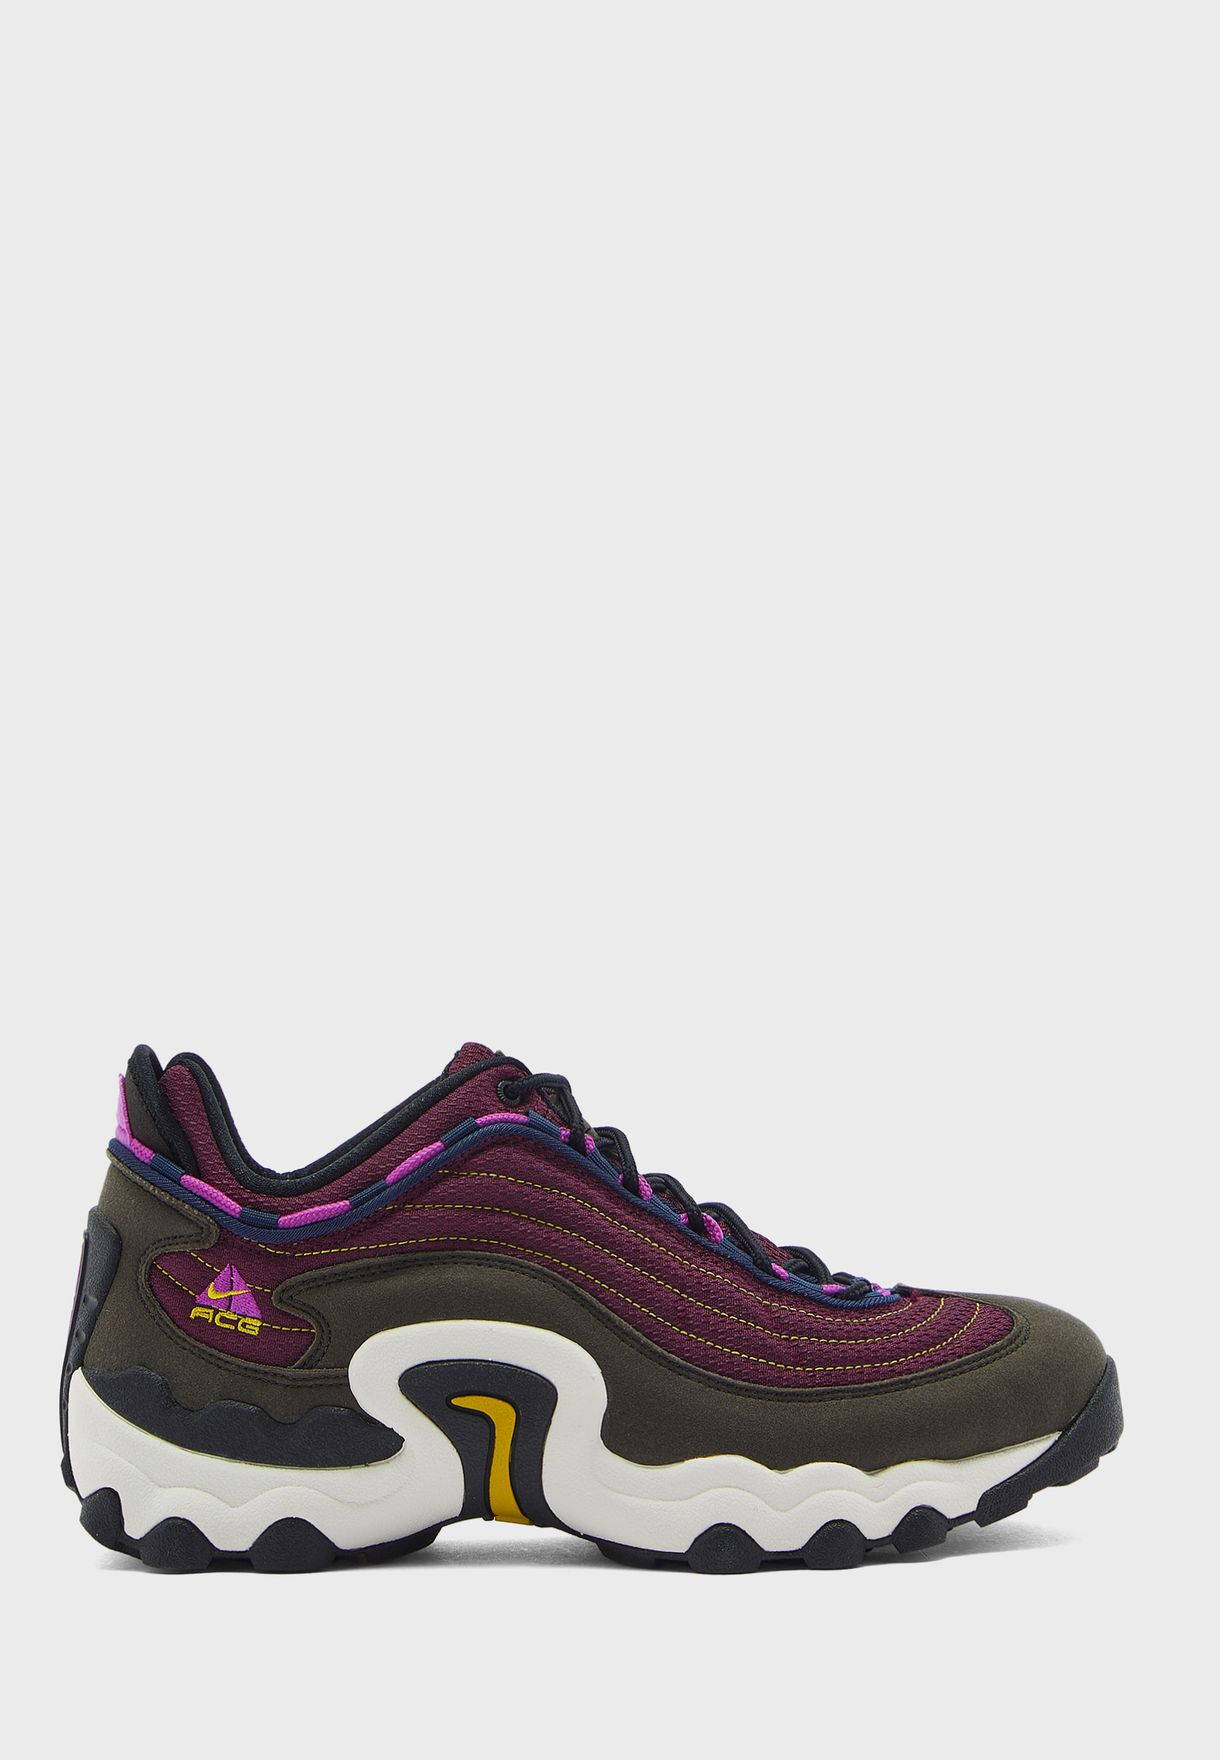 Buy Nike multicolor Air Skarn for Men